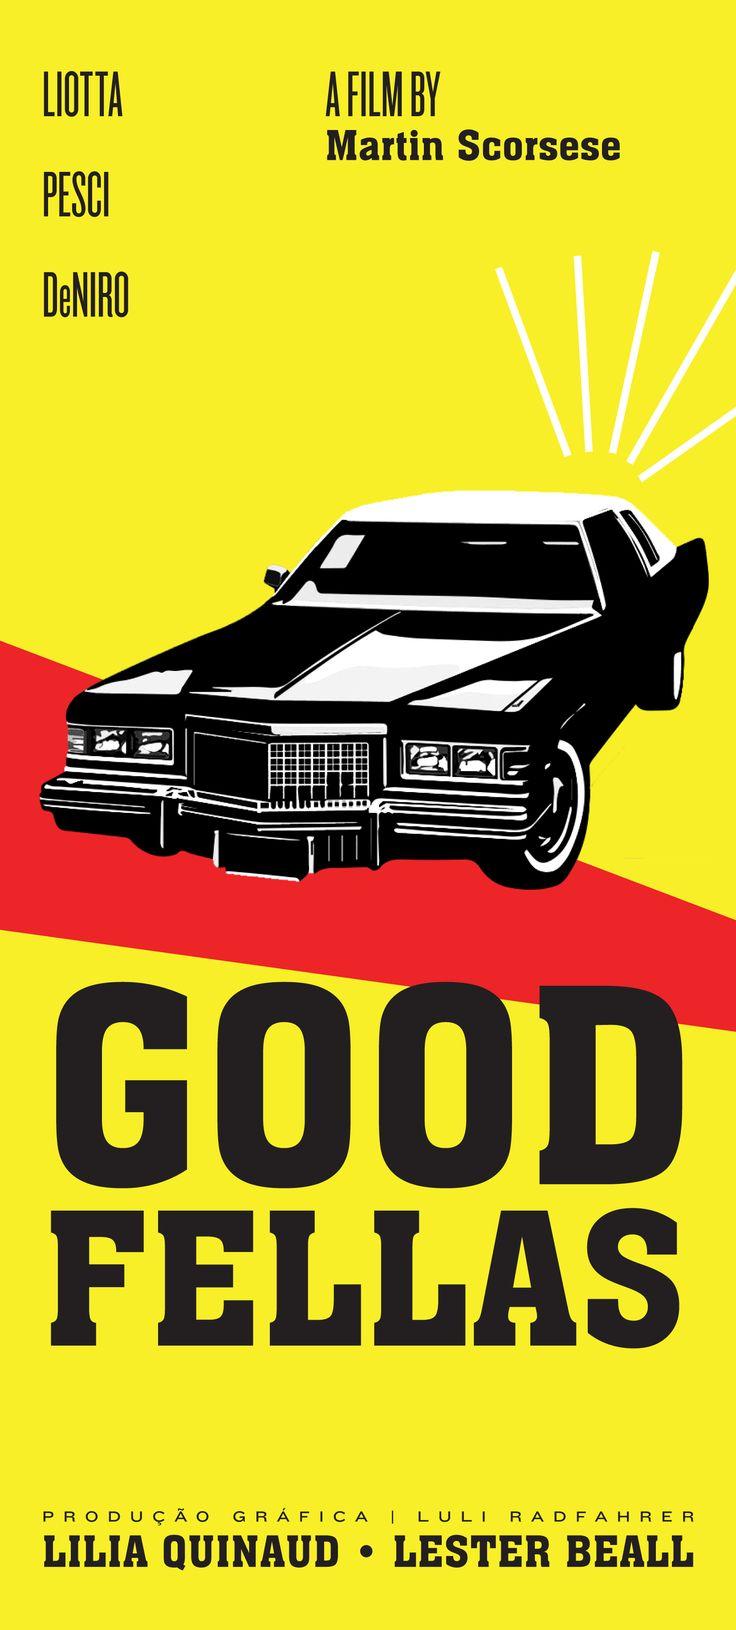 Goodfellas  - Alternative movie poster for the mob movie classic #GangsterMovie #GangsterFlick